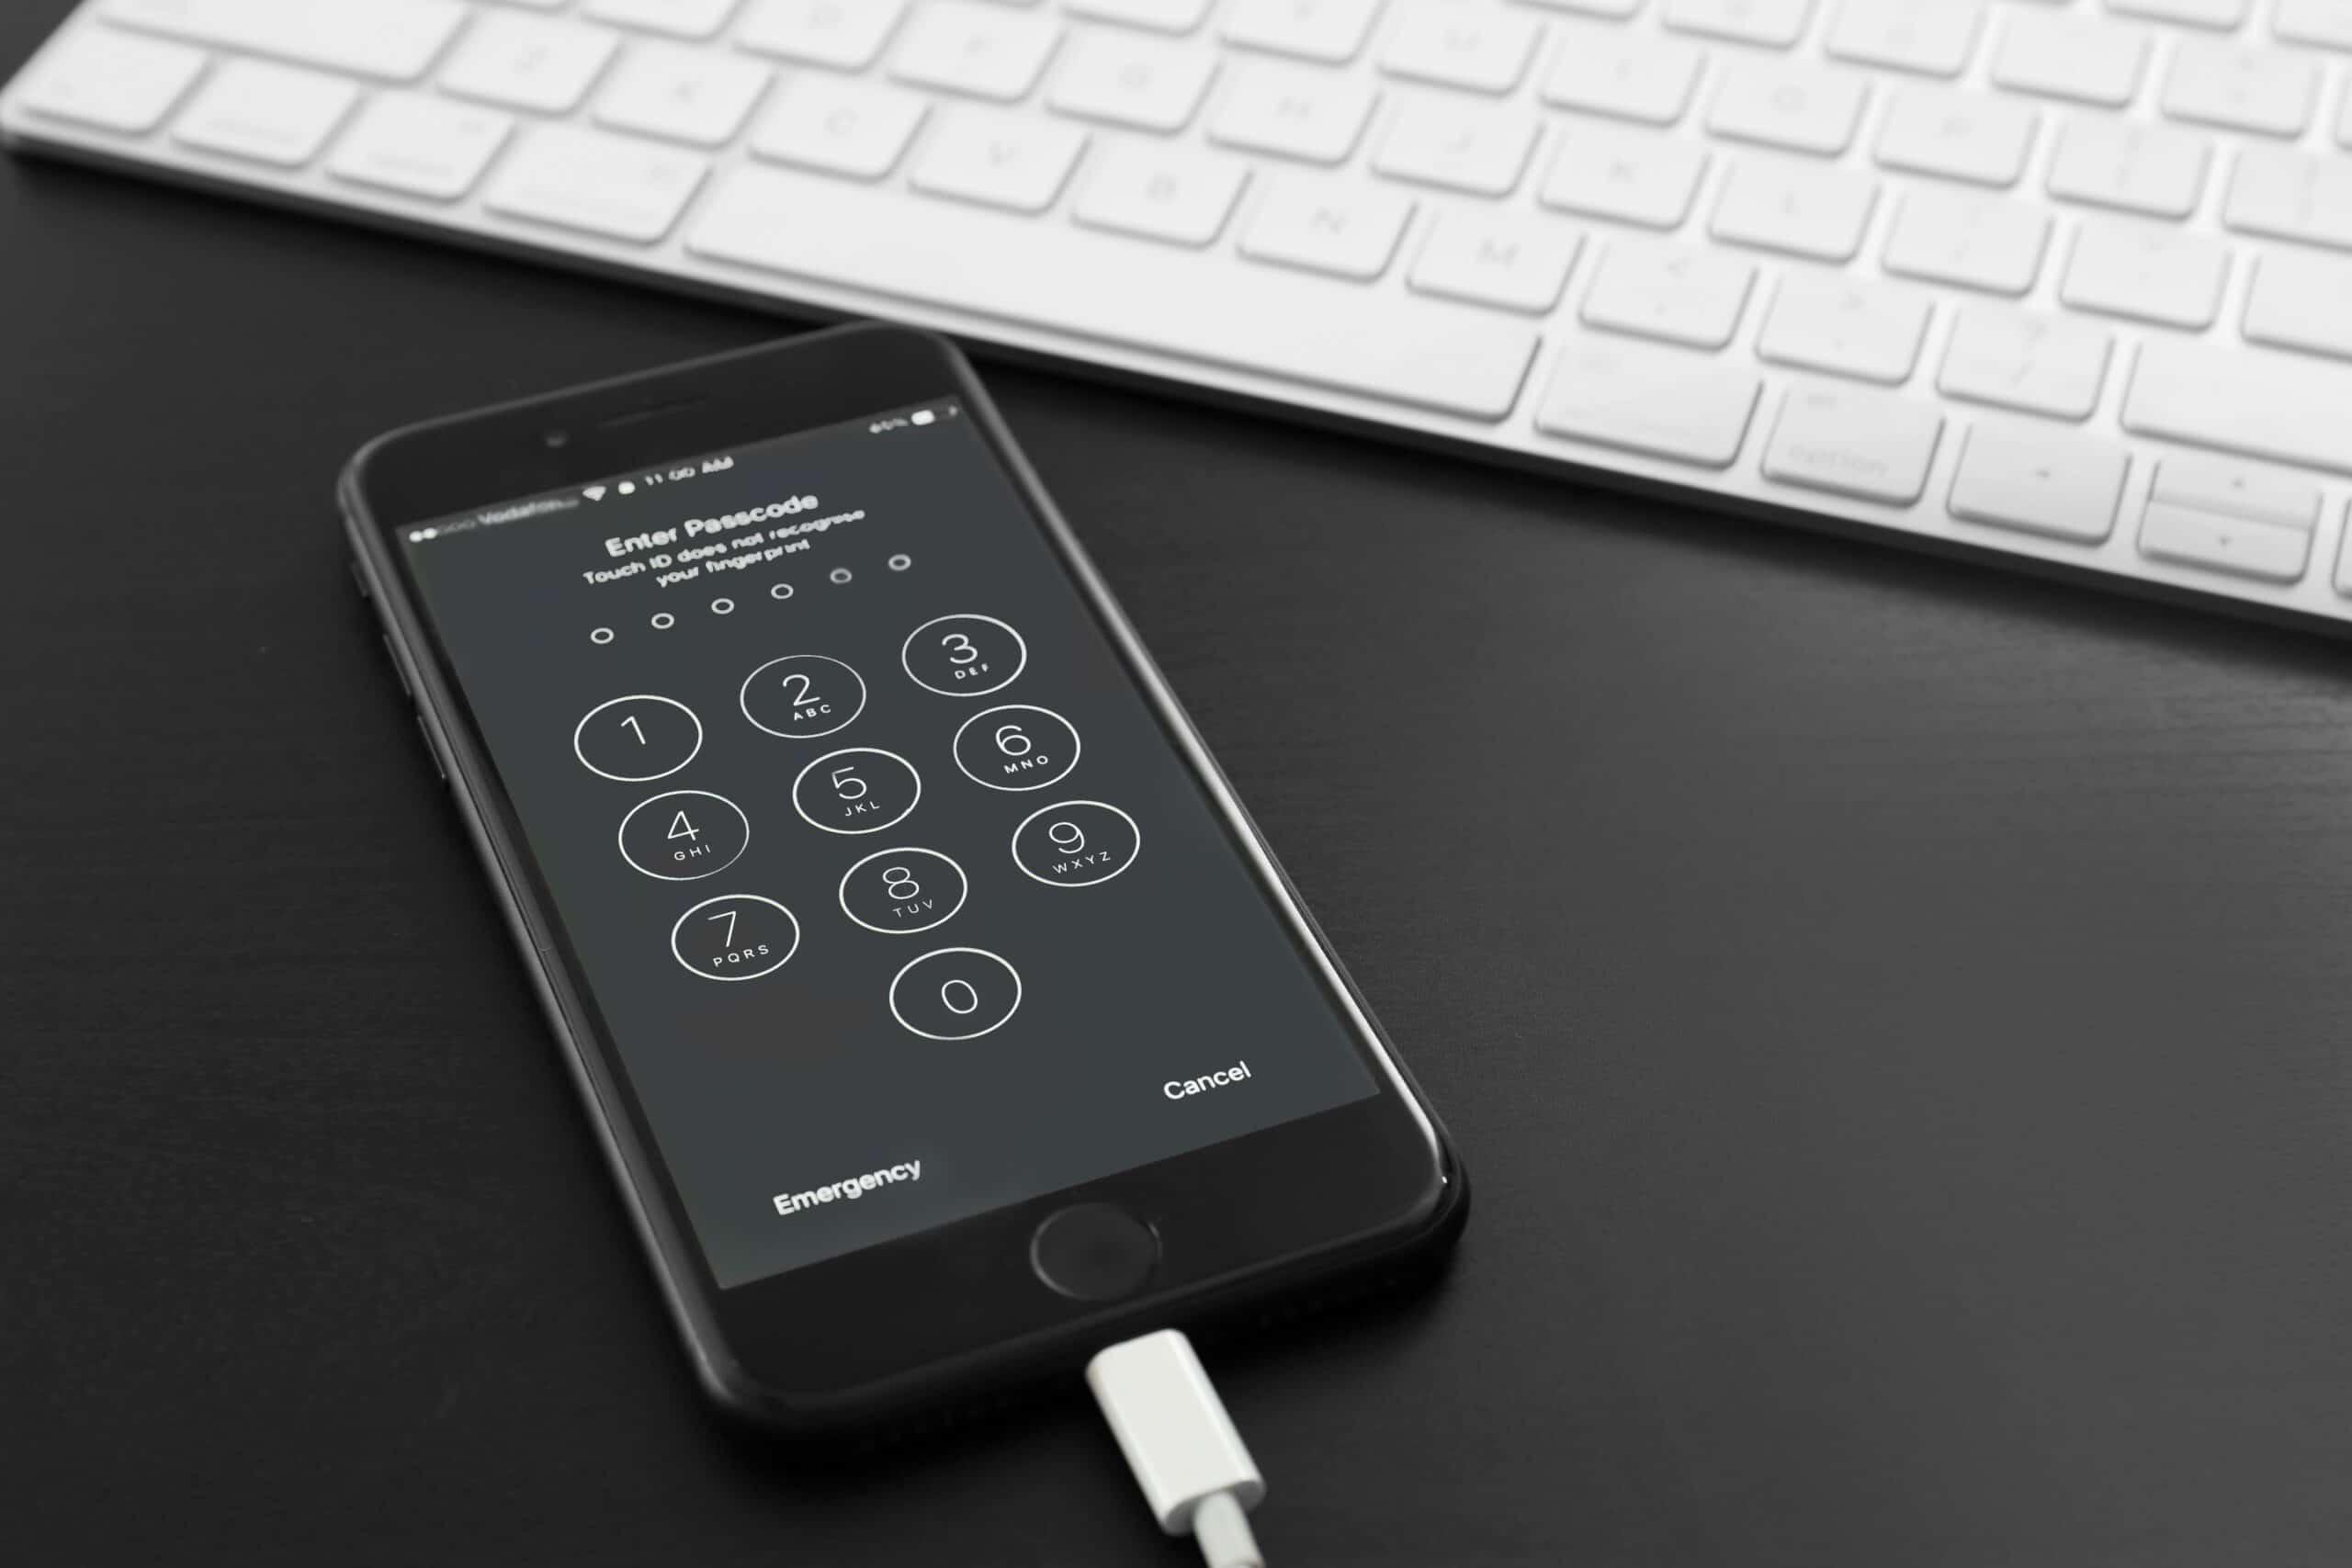 Senha do iPhone